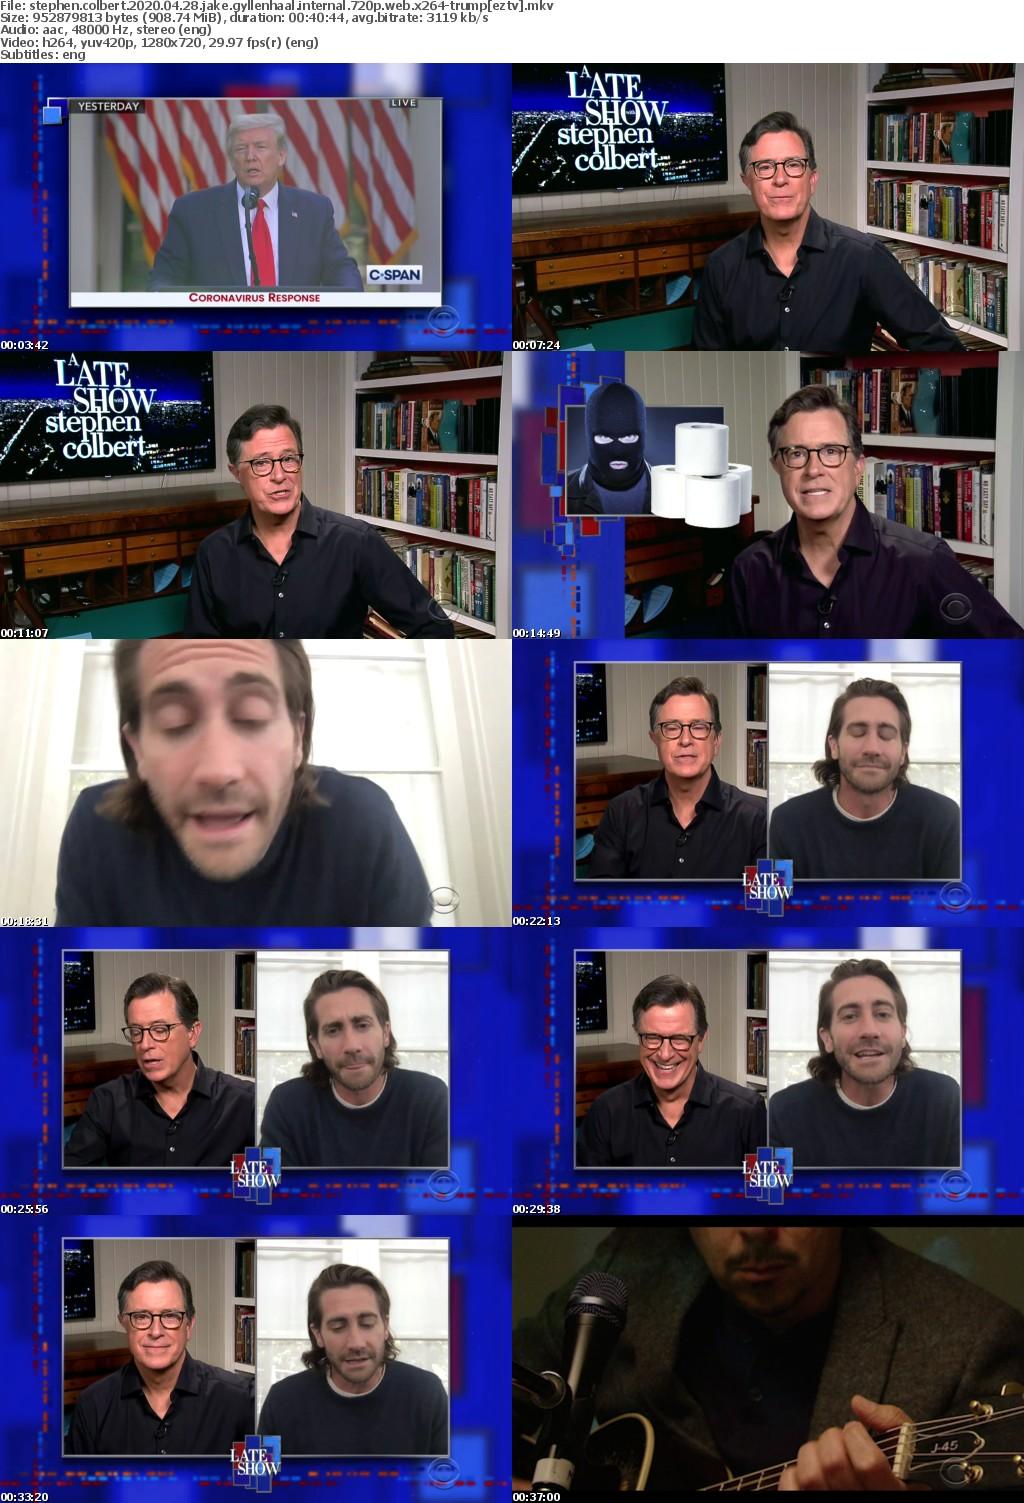 Stephen Colbert 2020 04 28 Jake Gyllenhaal iNTERNAL 720p WEB x264-TRUMP